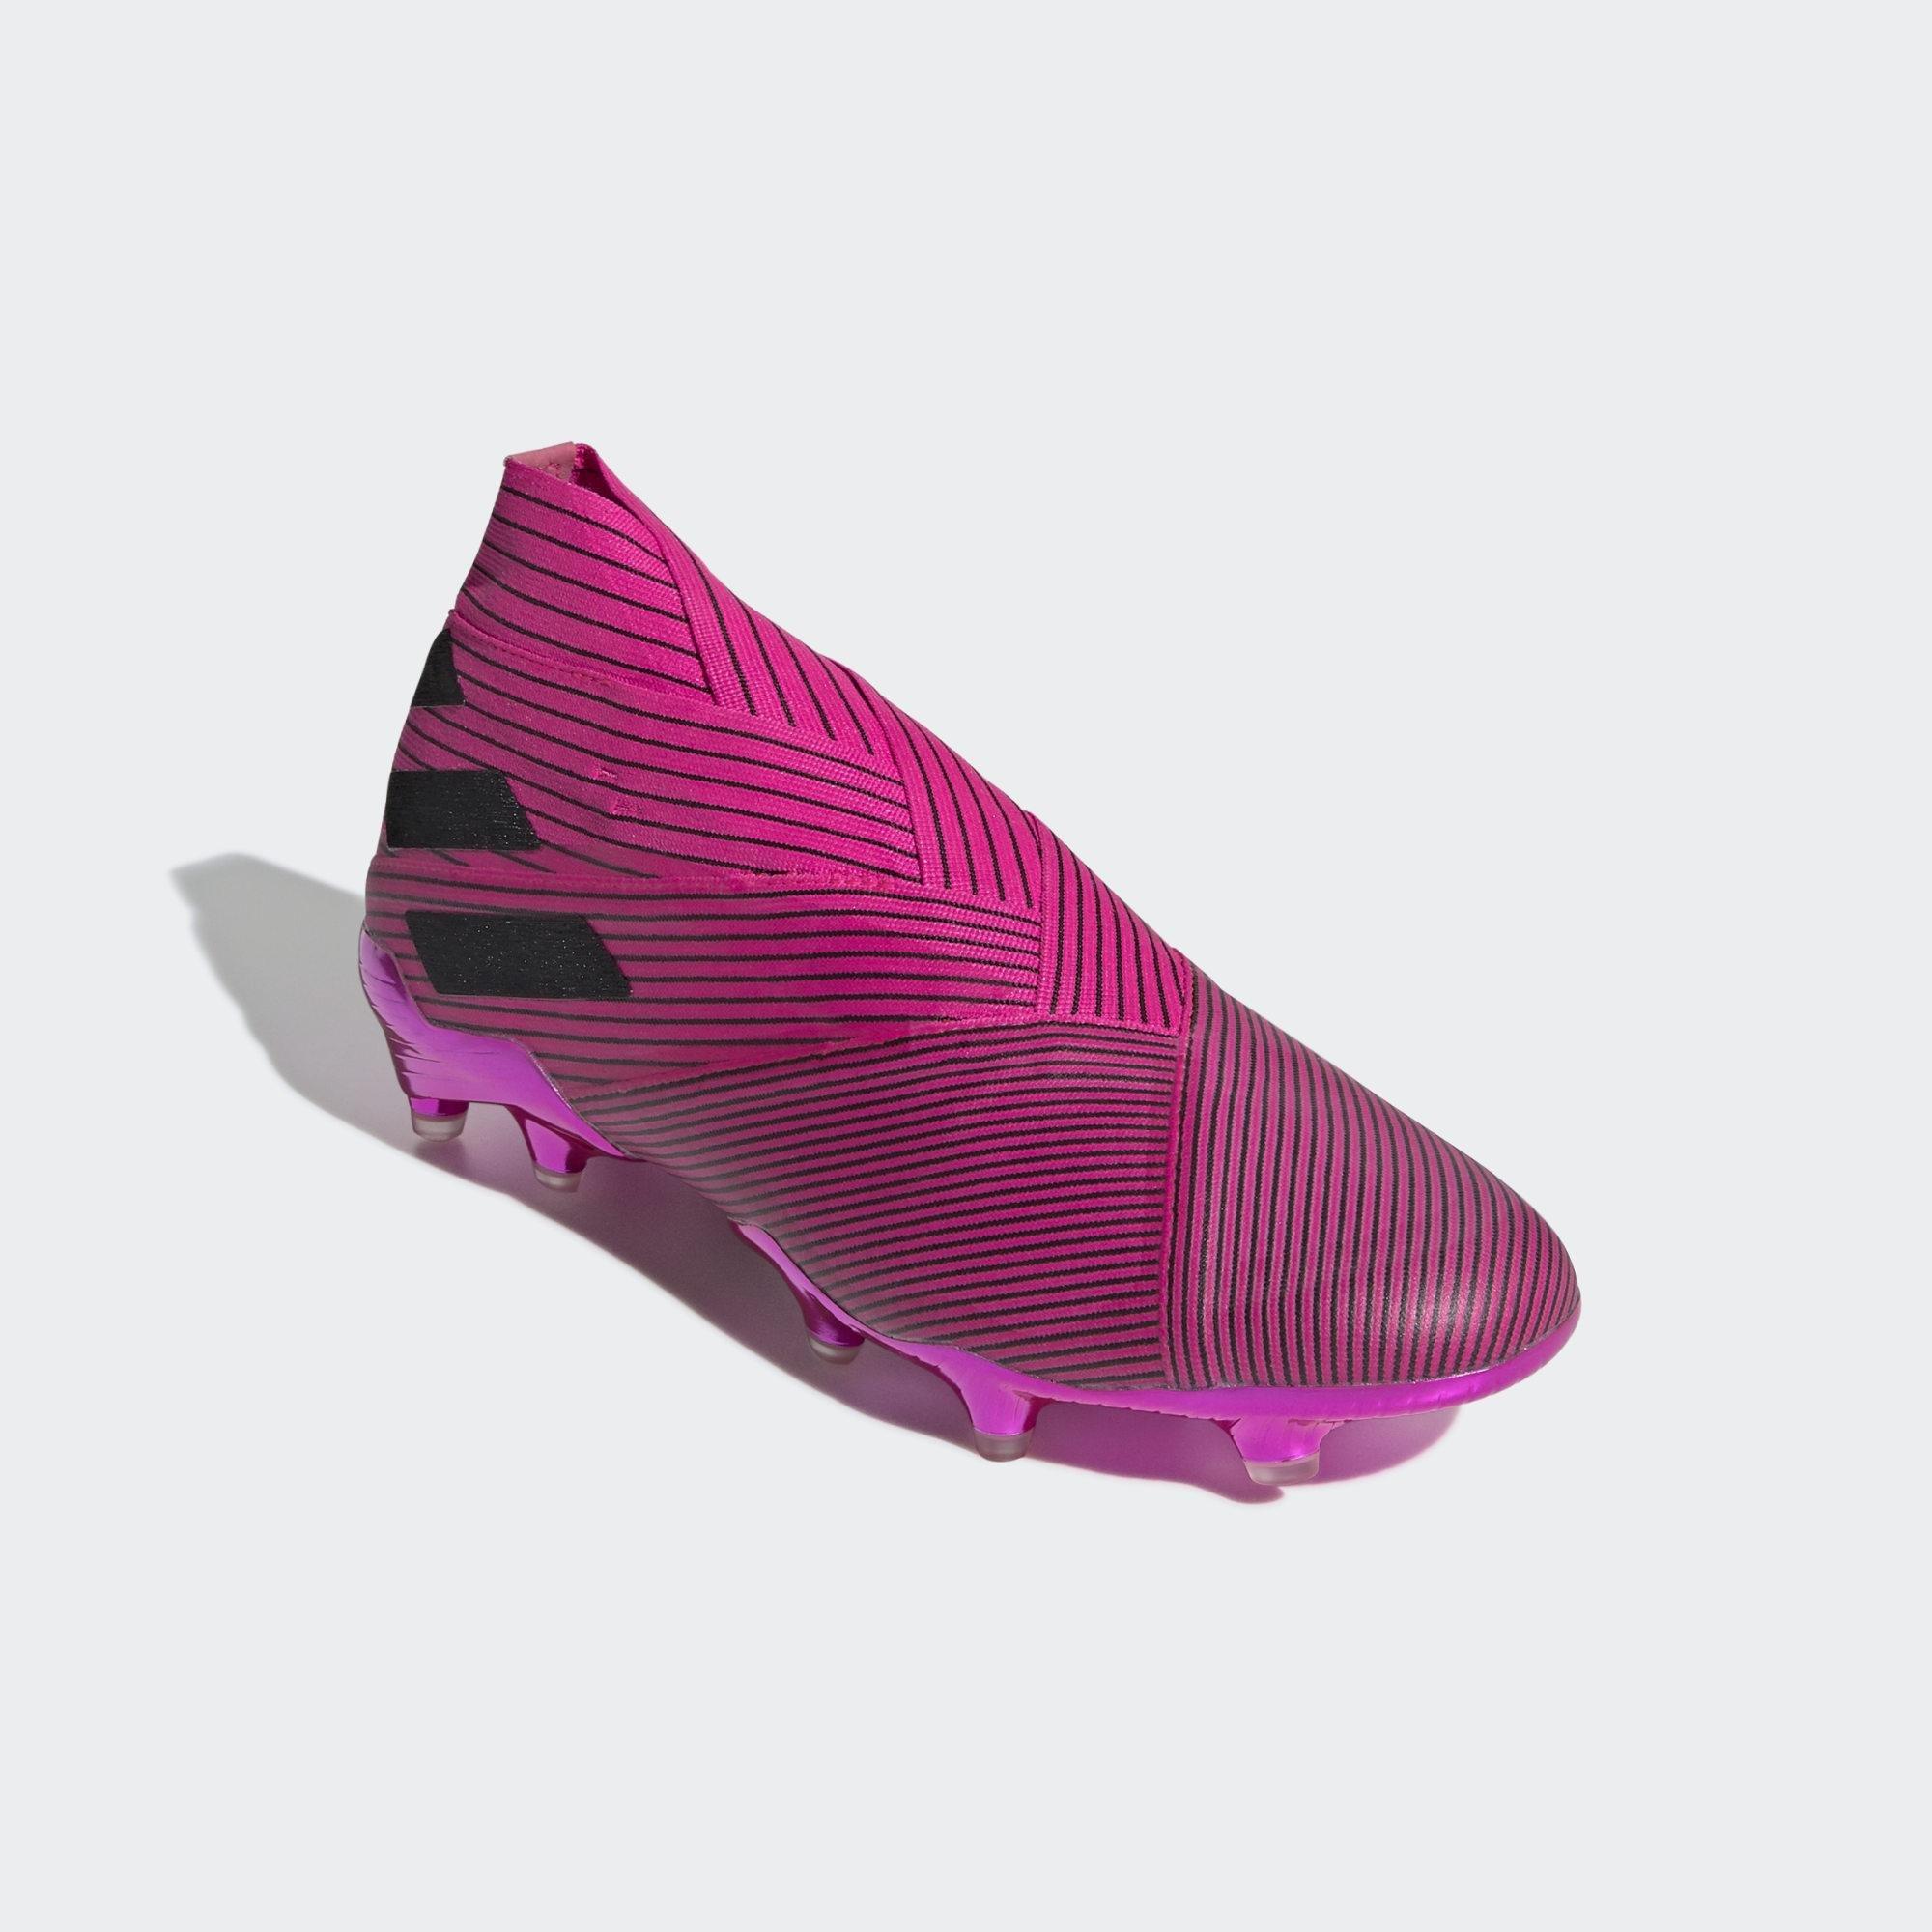 Bota de fútbol Nemeziz 19+ césped natural seco adidas de color Rosa